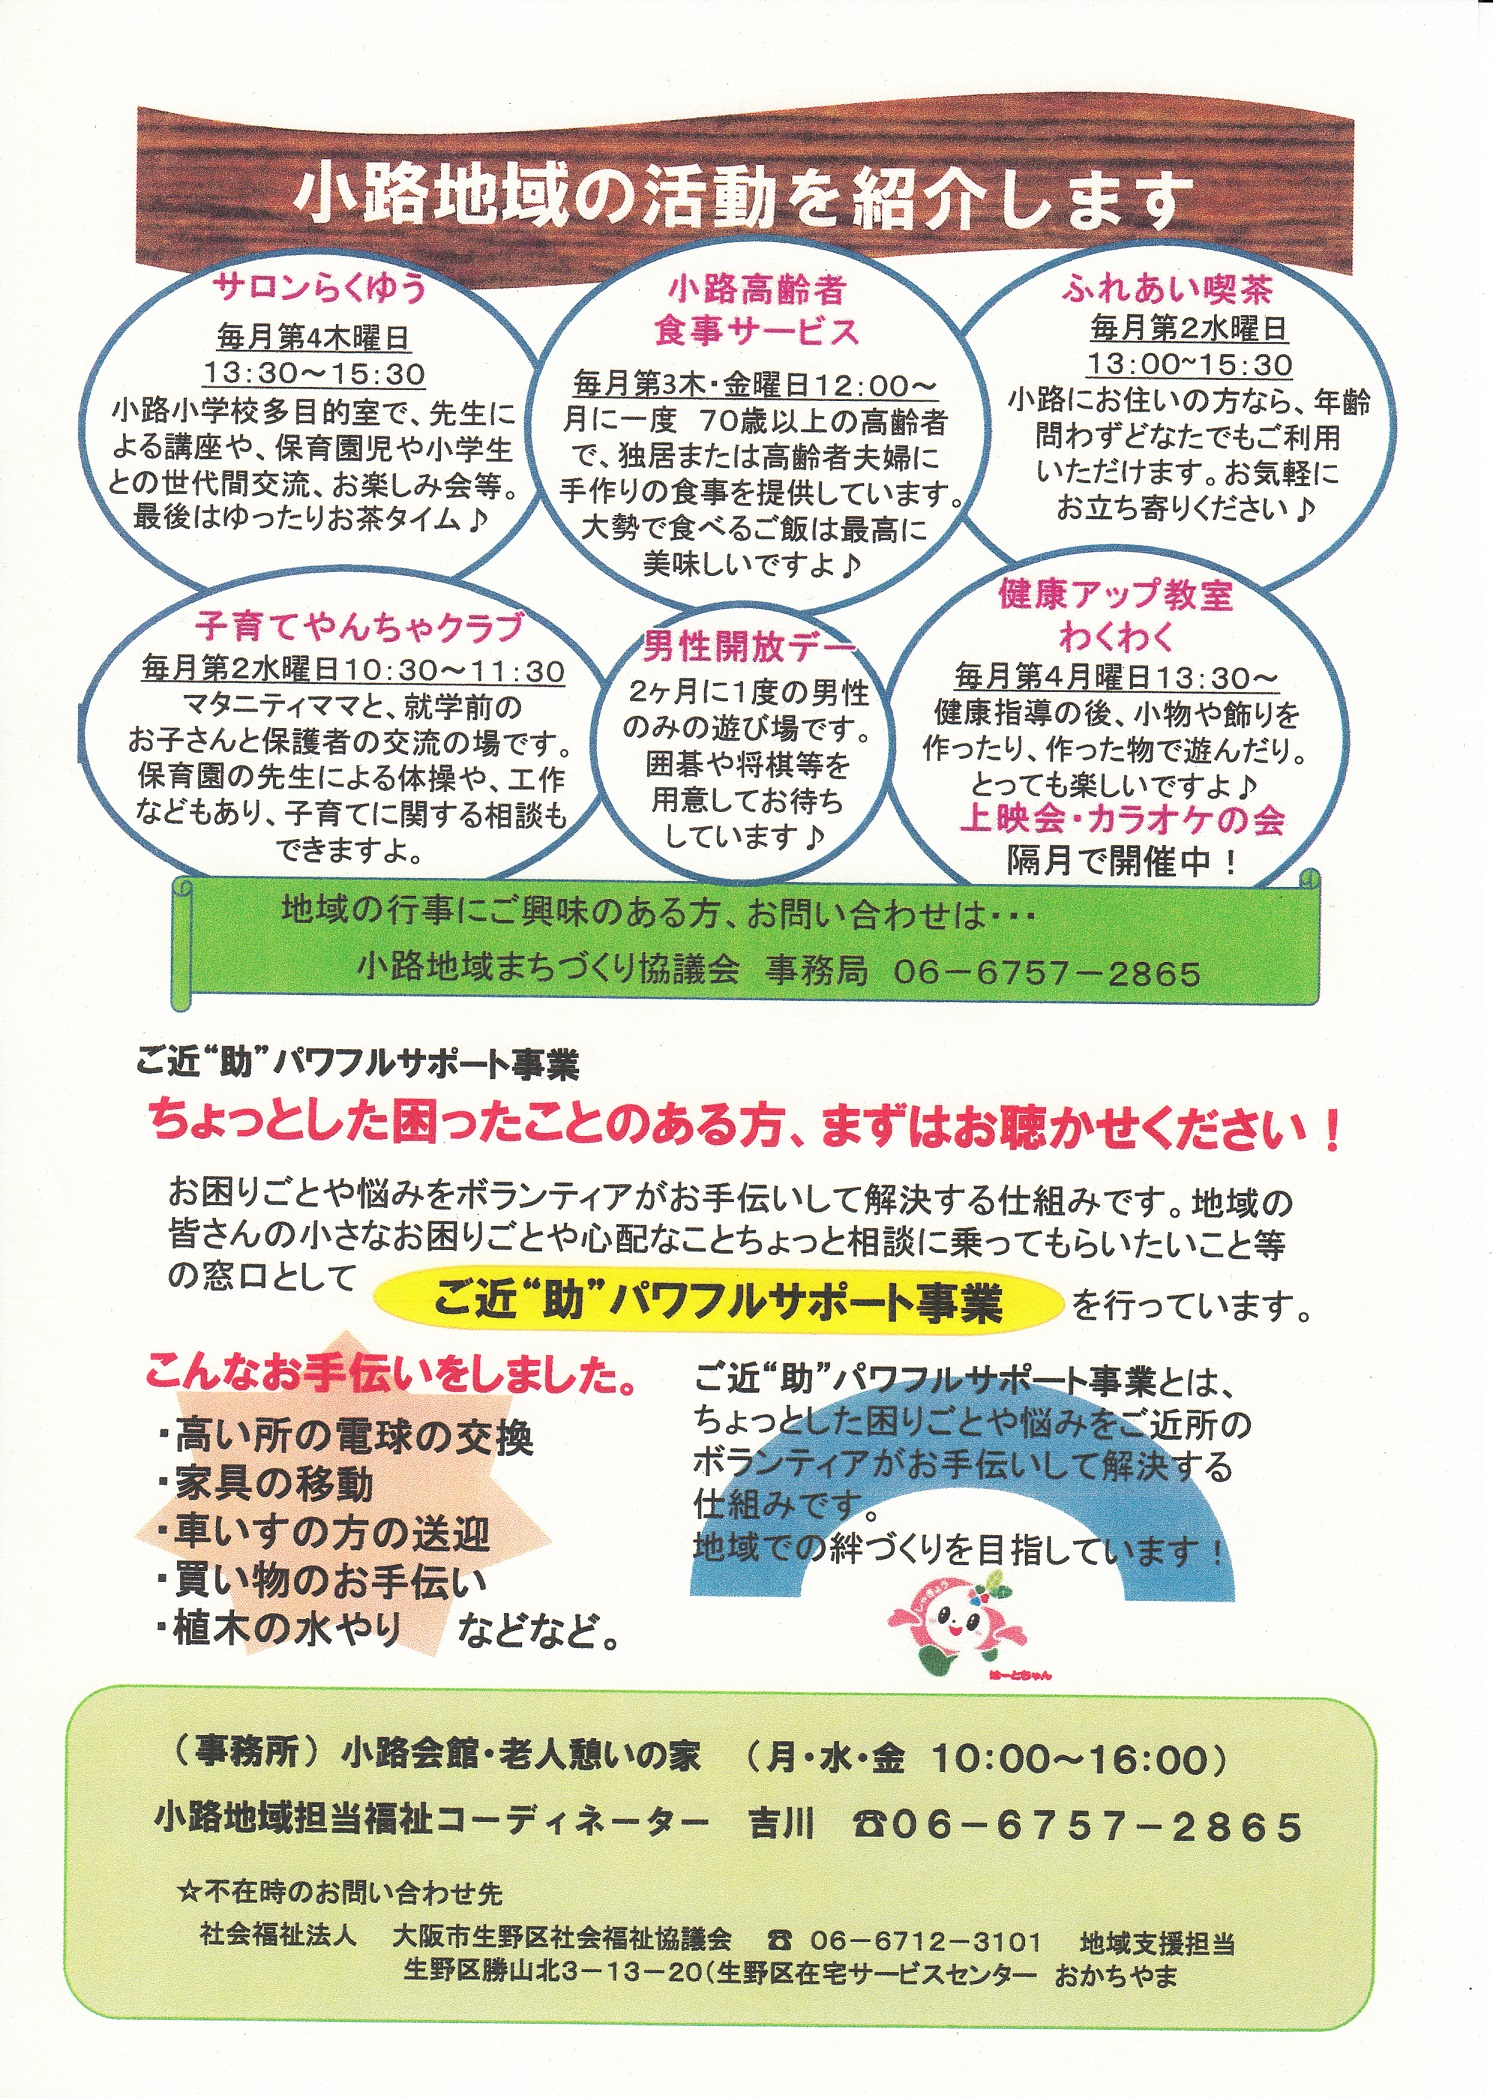 sIMG_0004.jpg